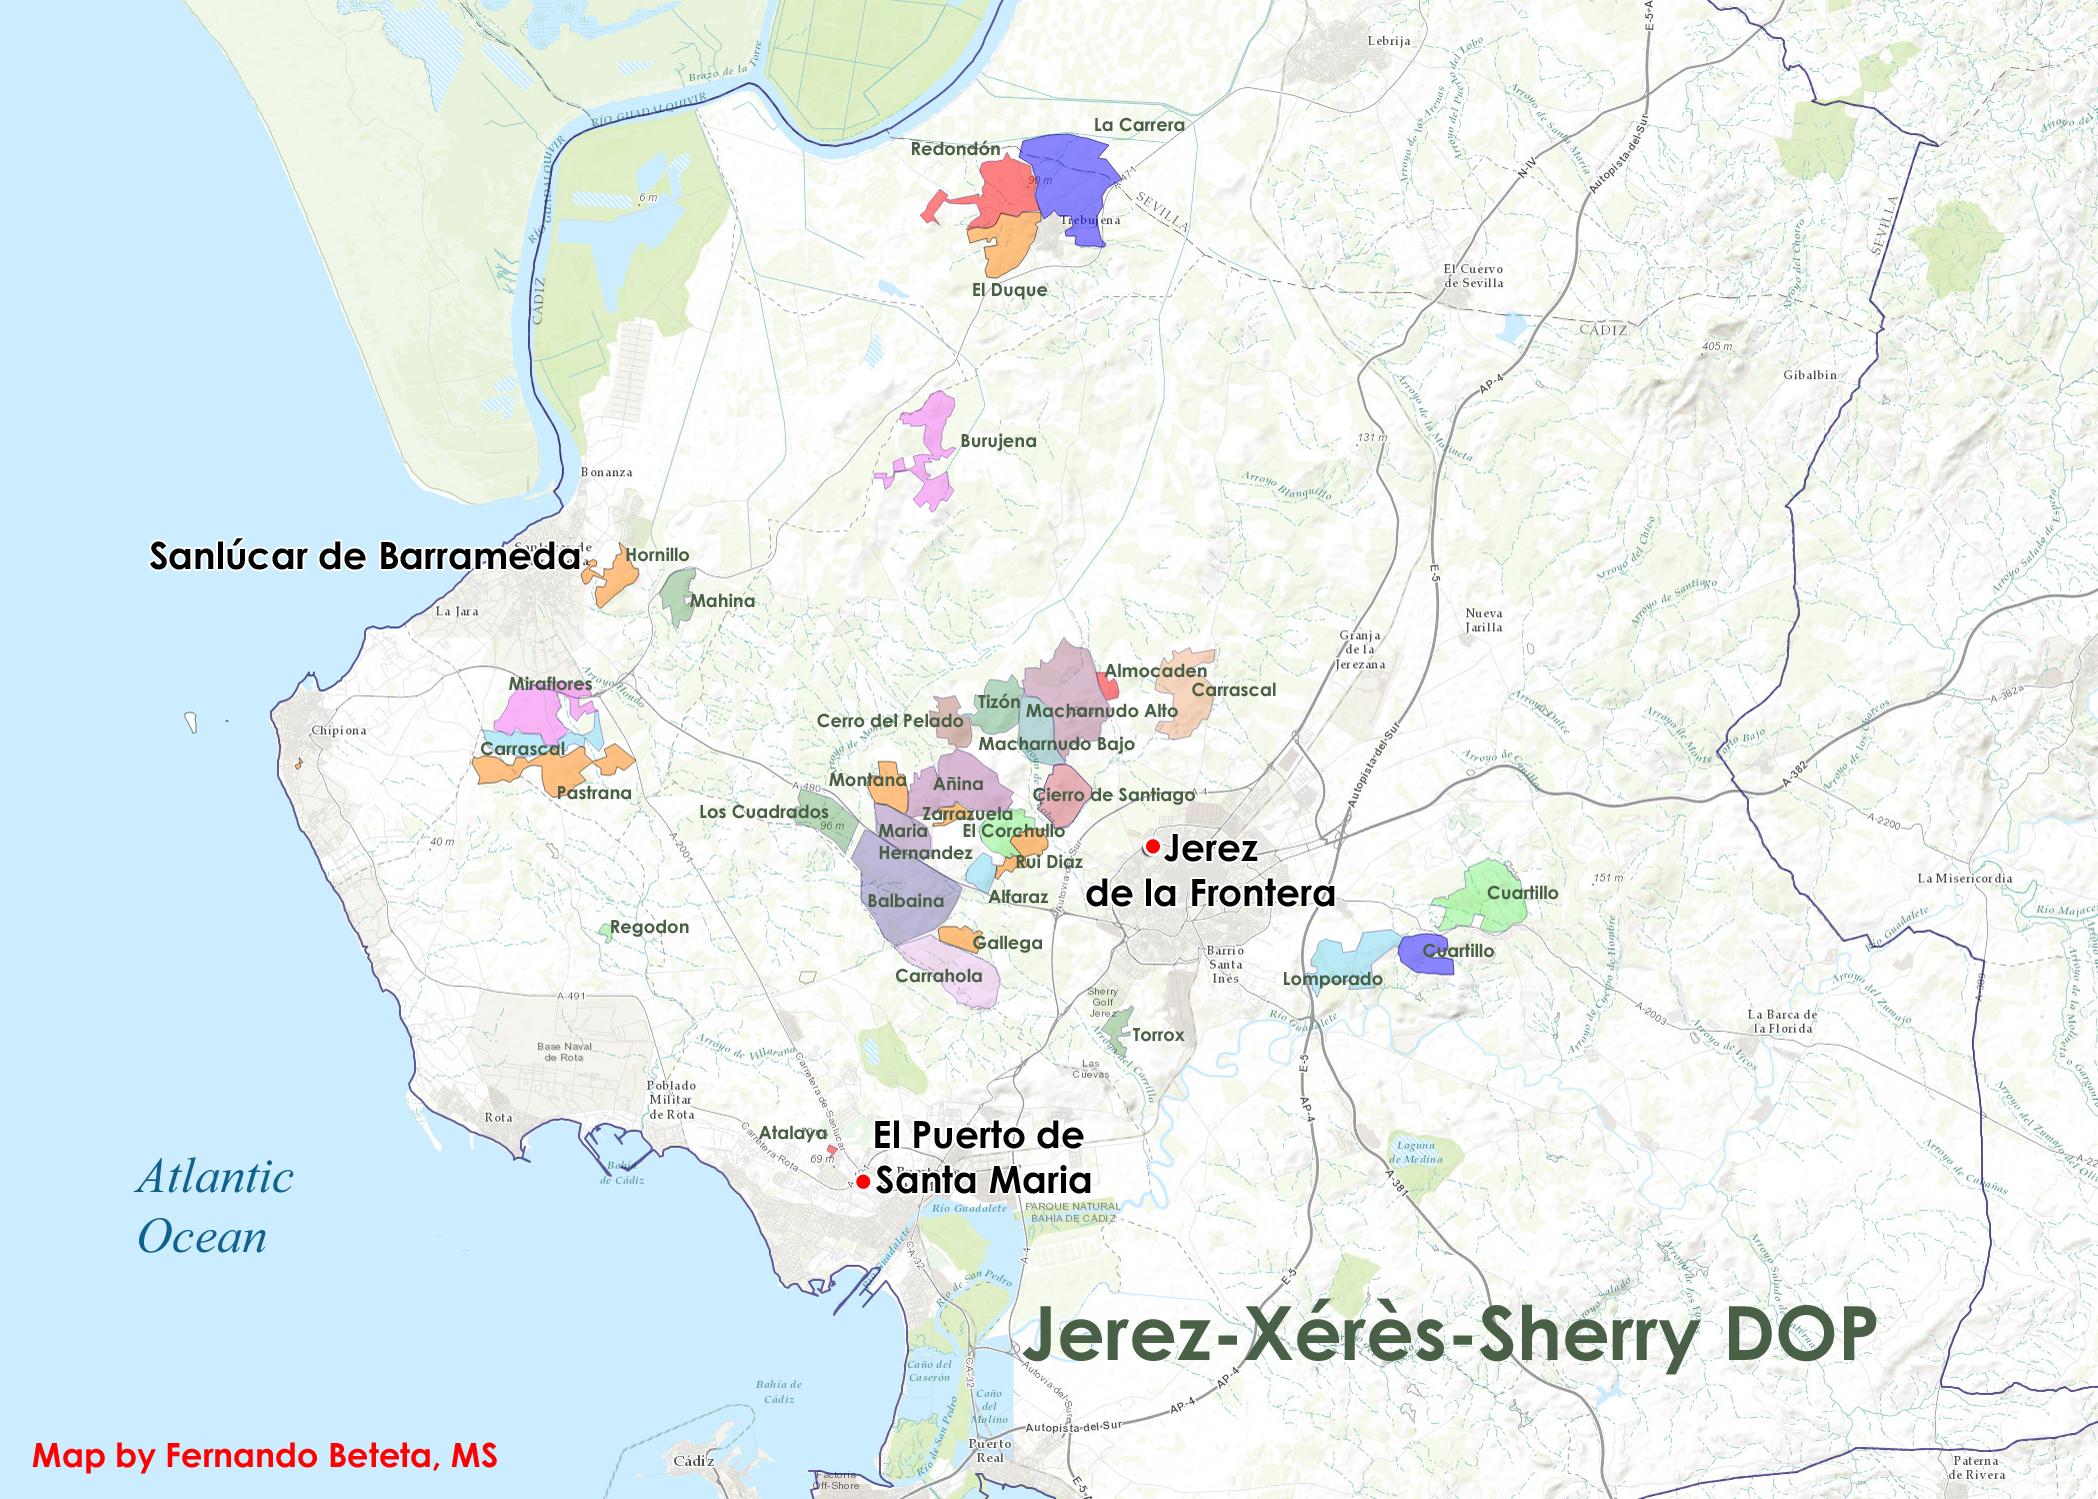 Spain - Xeres-Jerez-Sherry